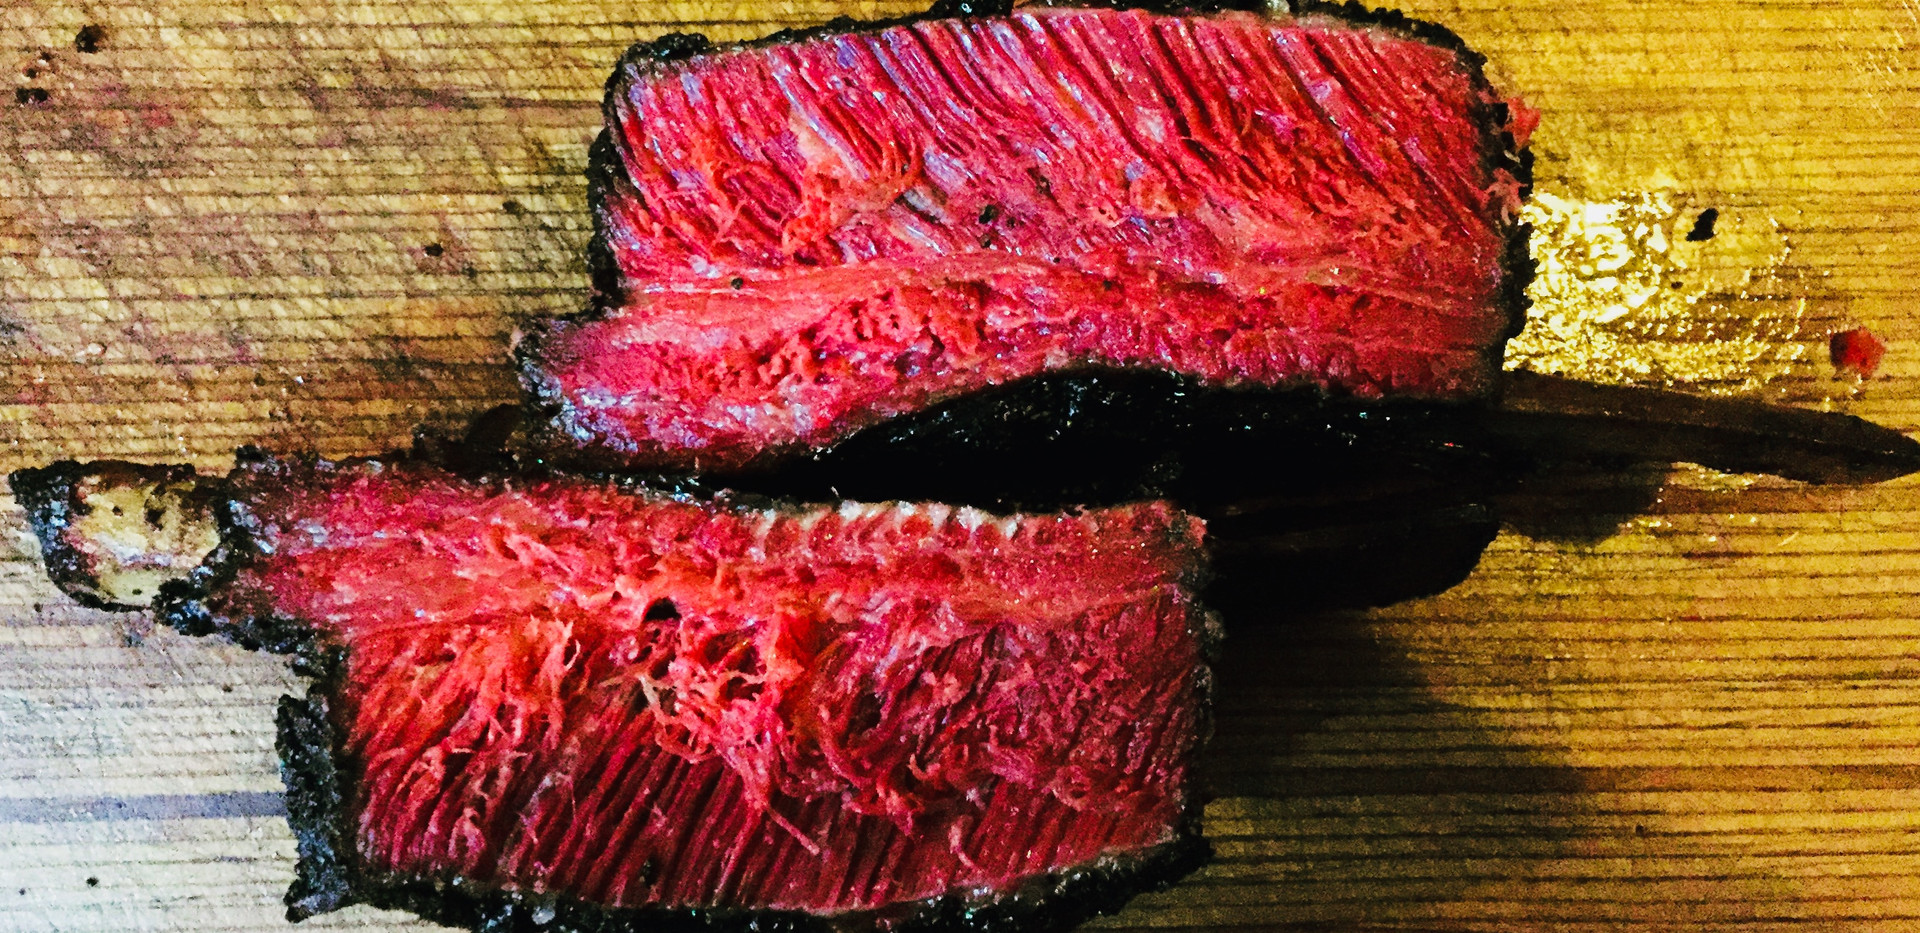 Pastrami Beef Rib